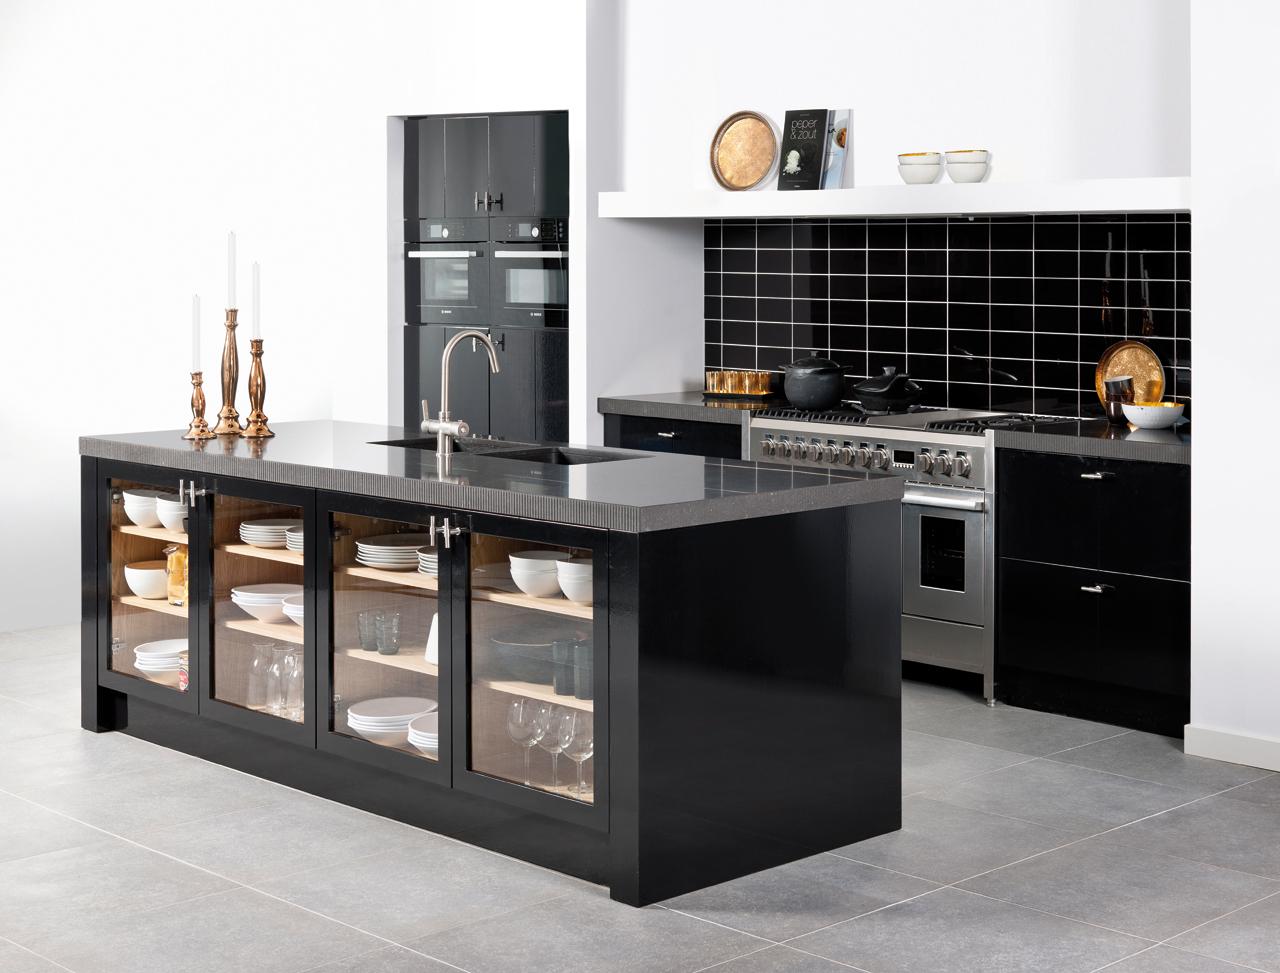 Keuken Tegels Kopen – Atumre.com